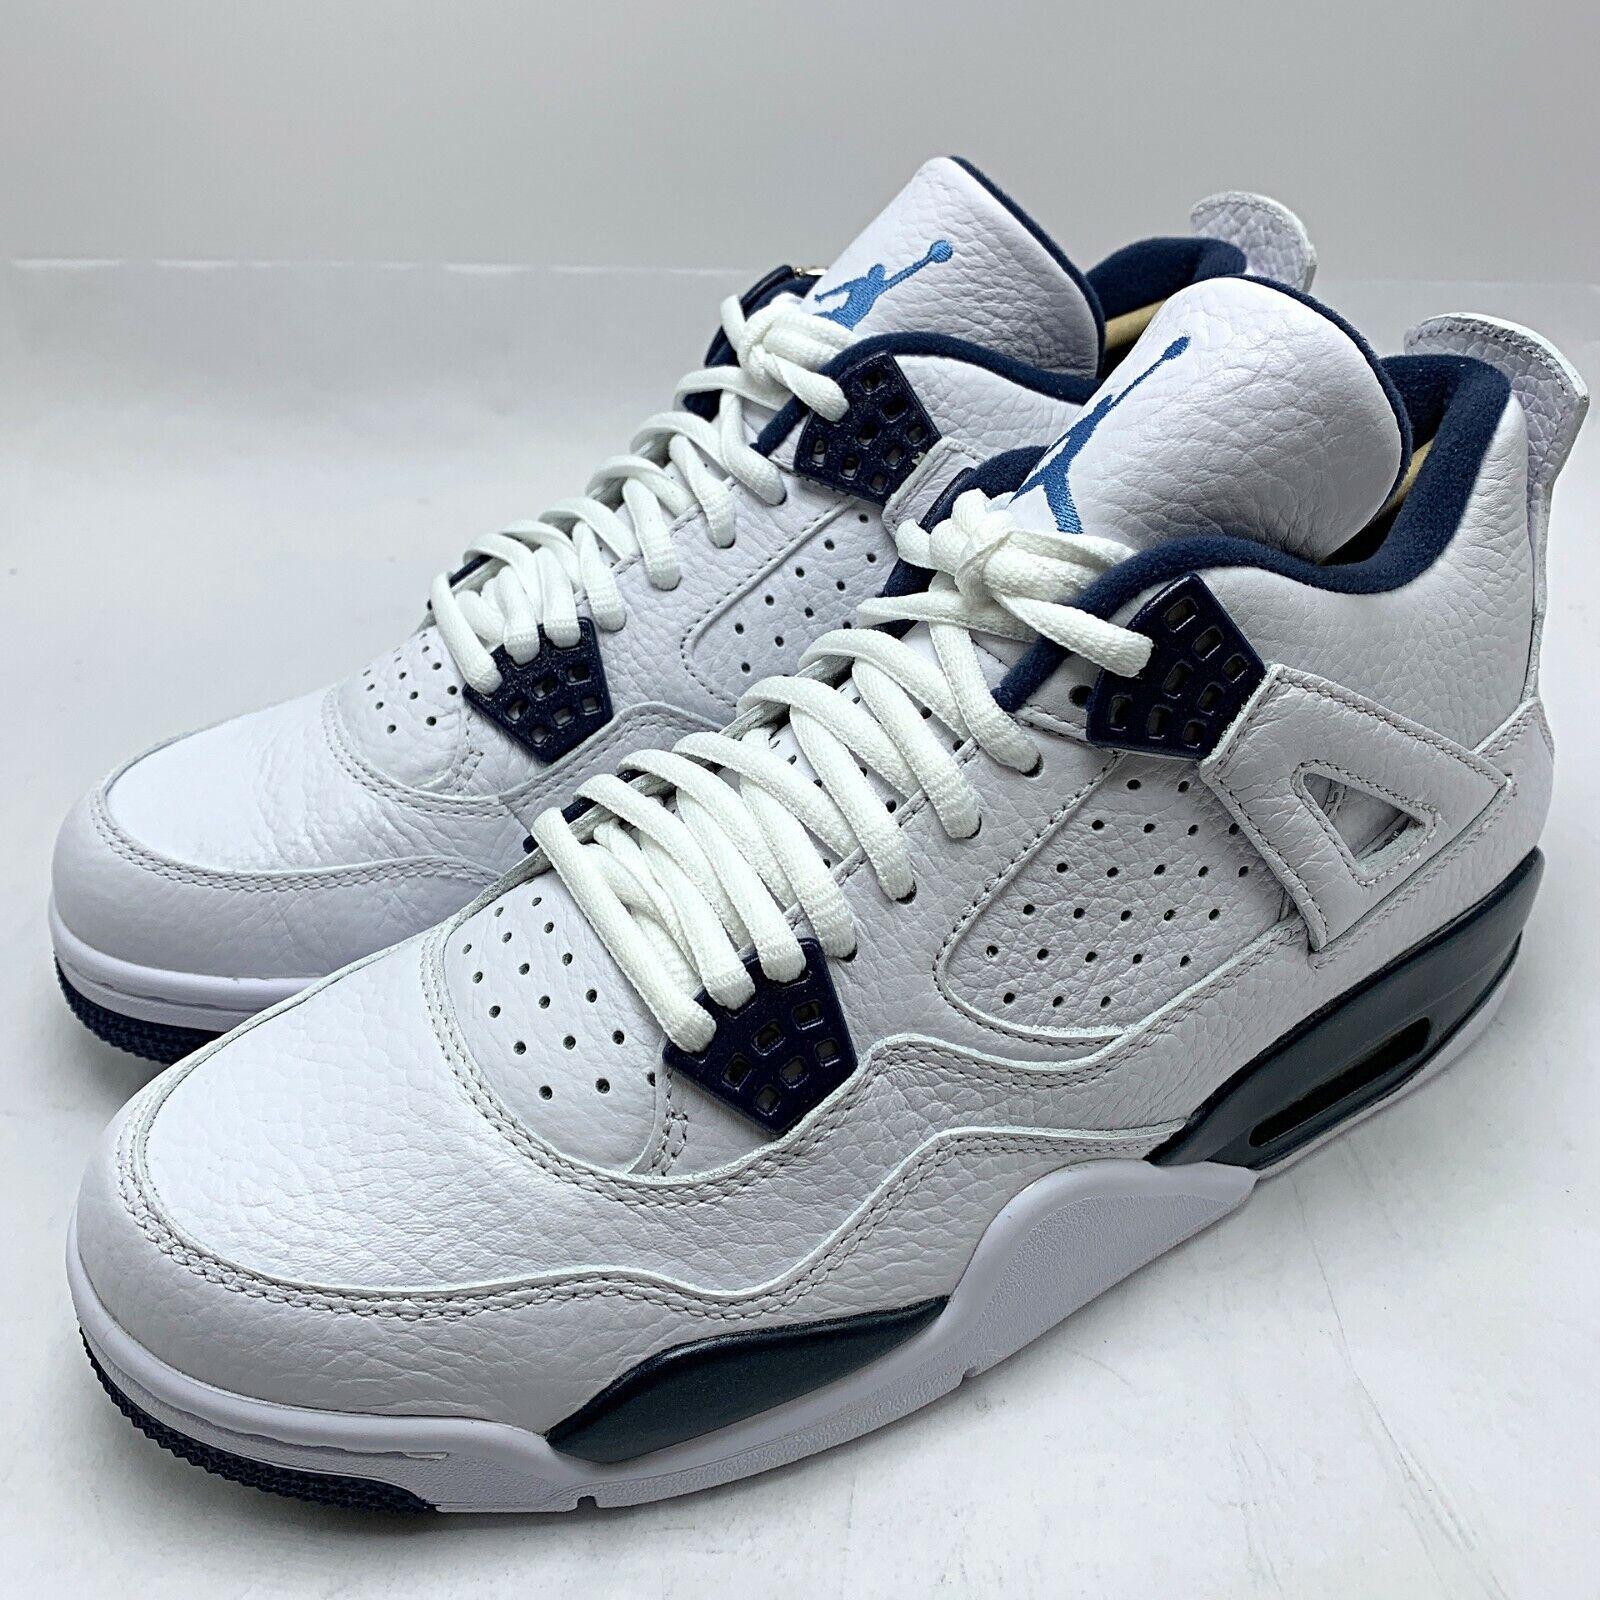 sito affidabile materiale selezionato tessuti pregiati Nike Air Jordan 4 Retro LS Men's Shoes White / Legend Blue - Navy ...